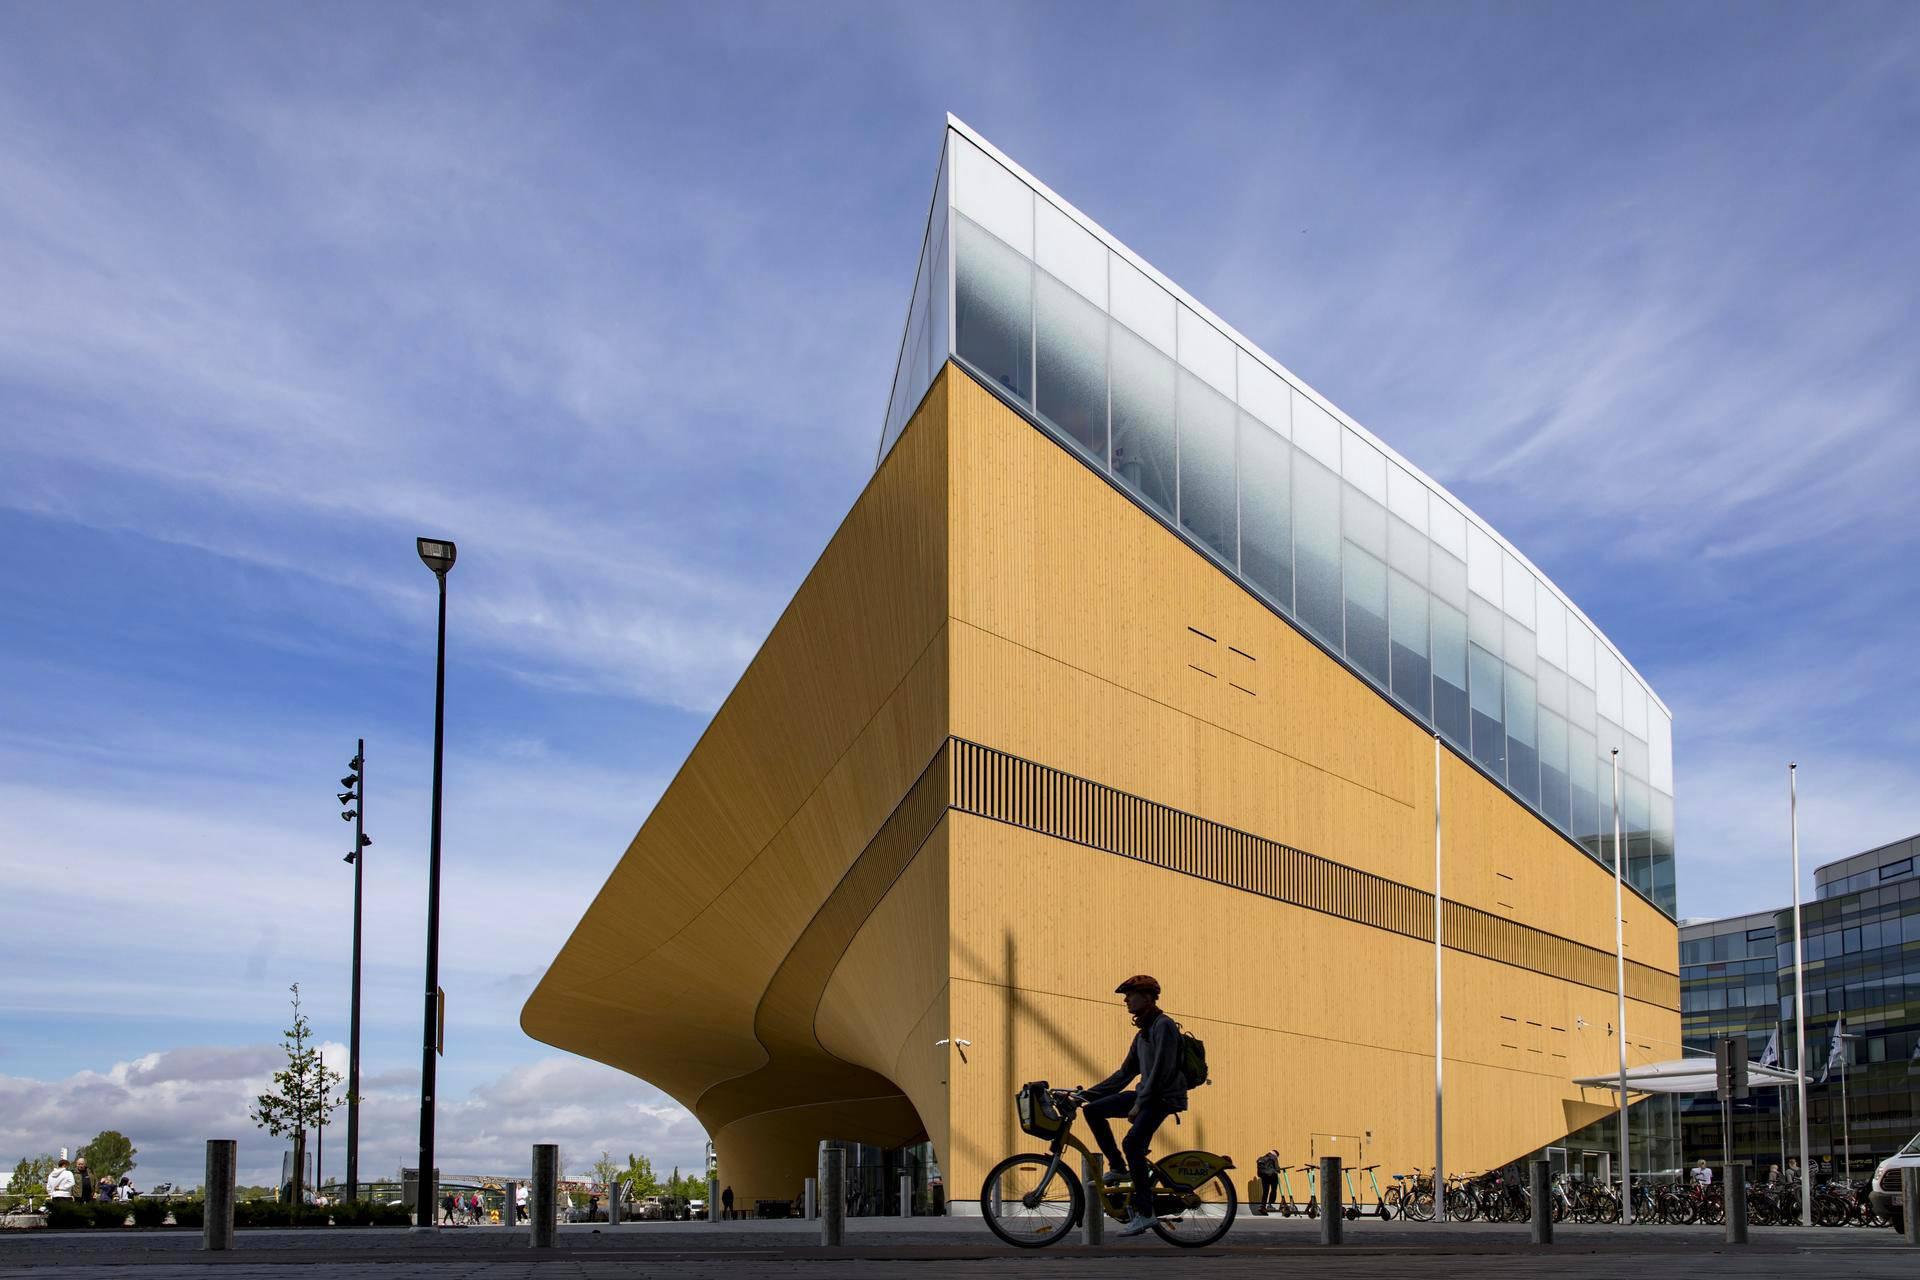 Visit Oodi Central Library in Helsinki